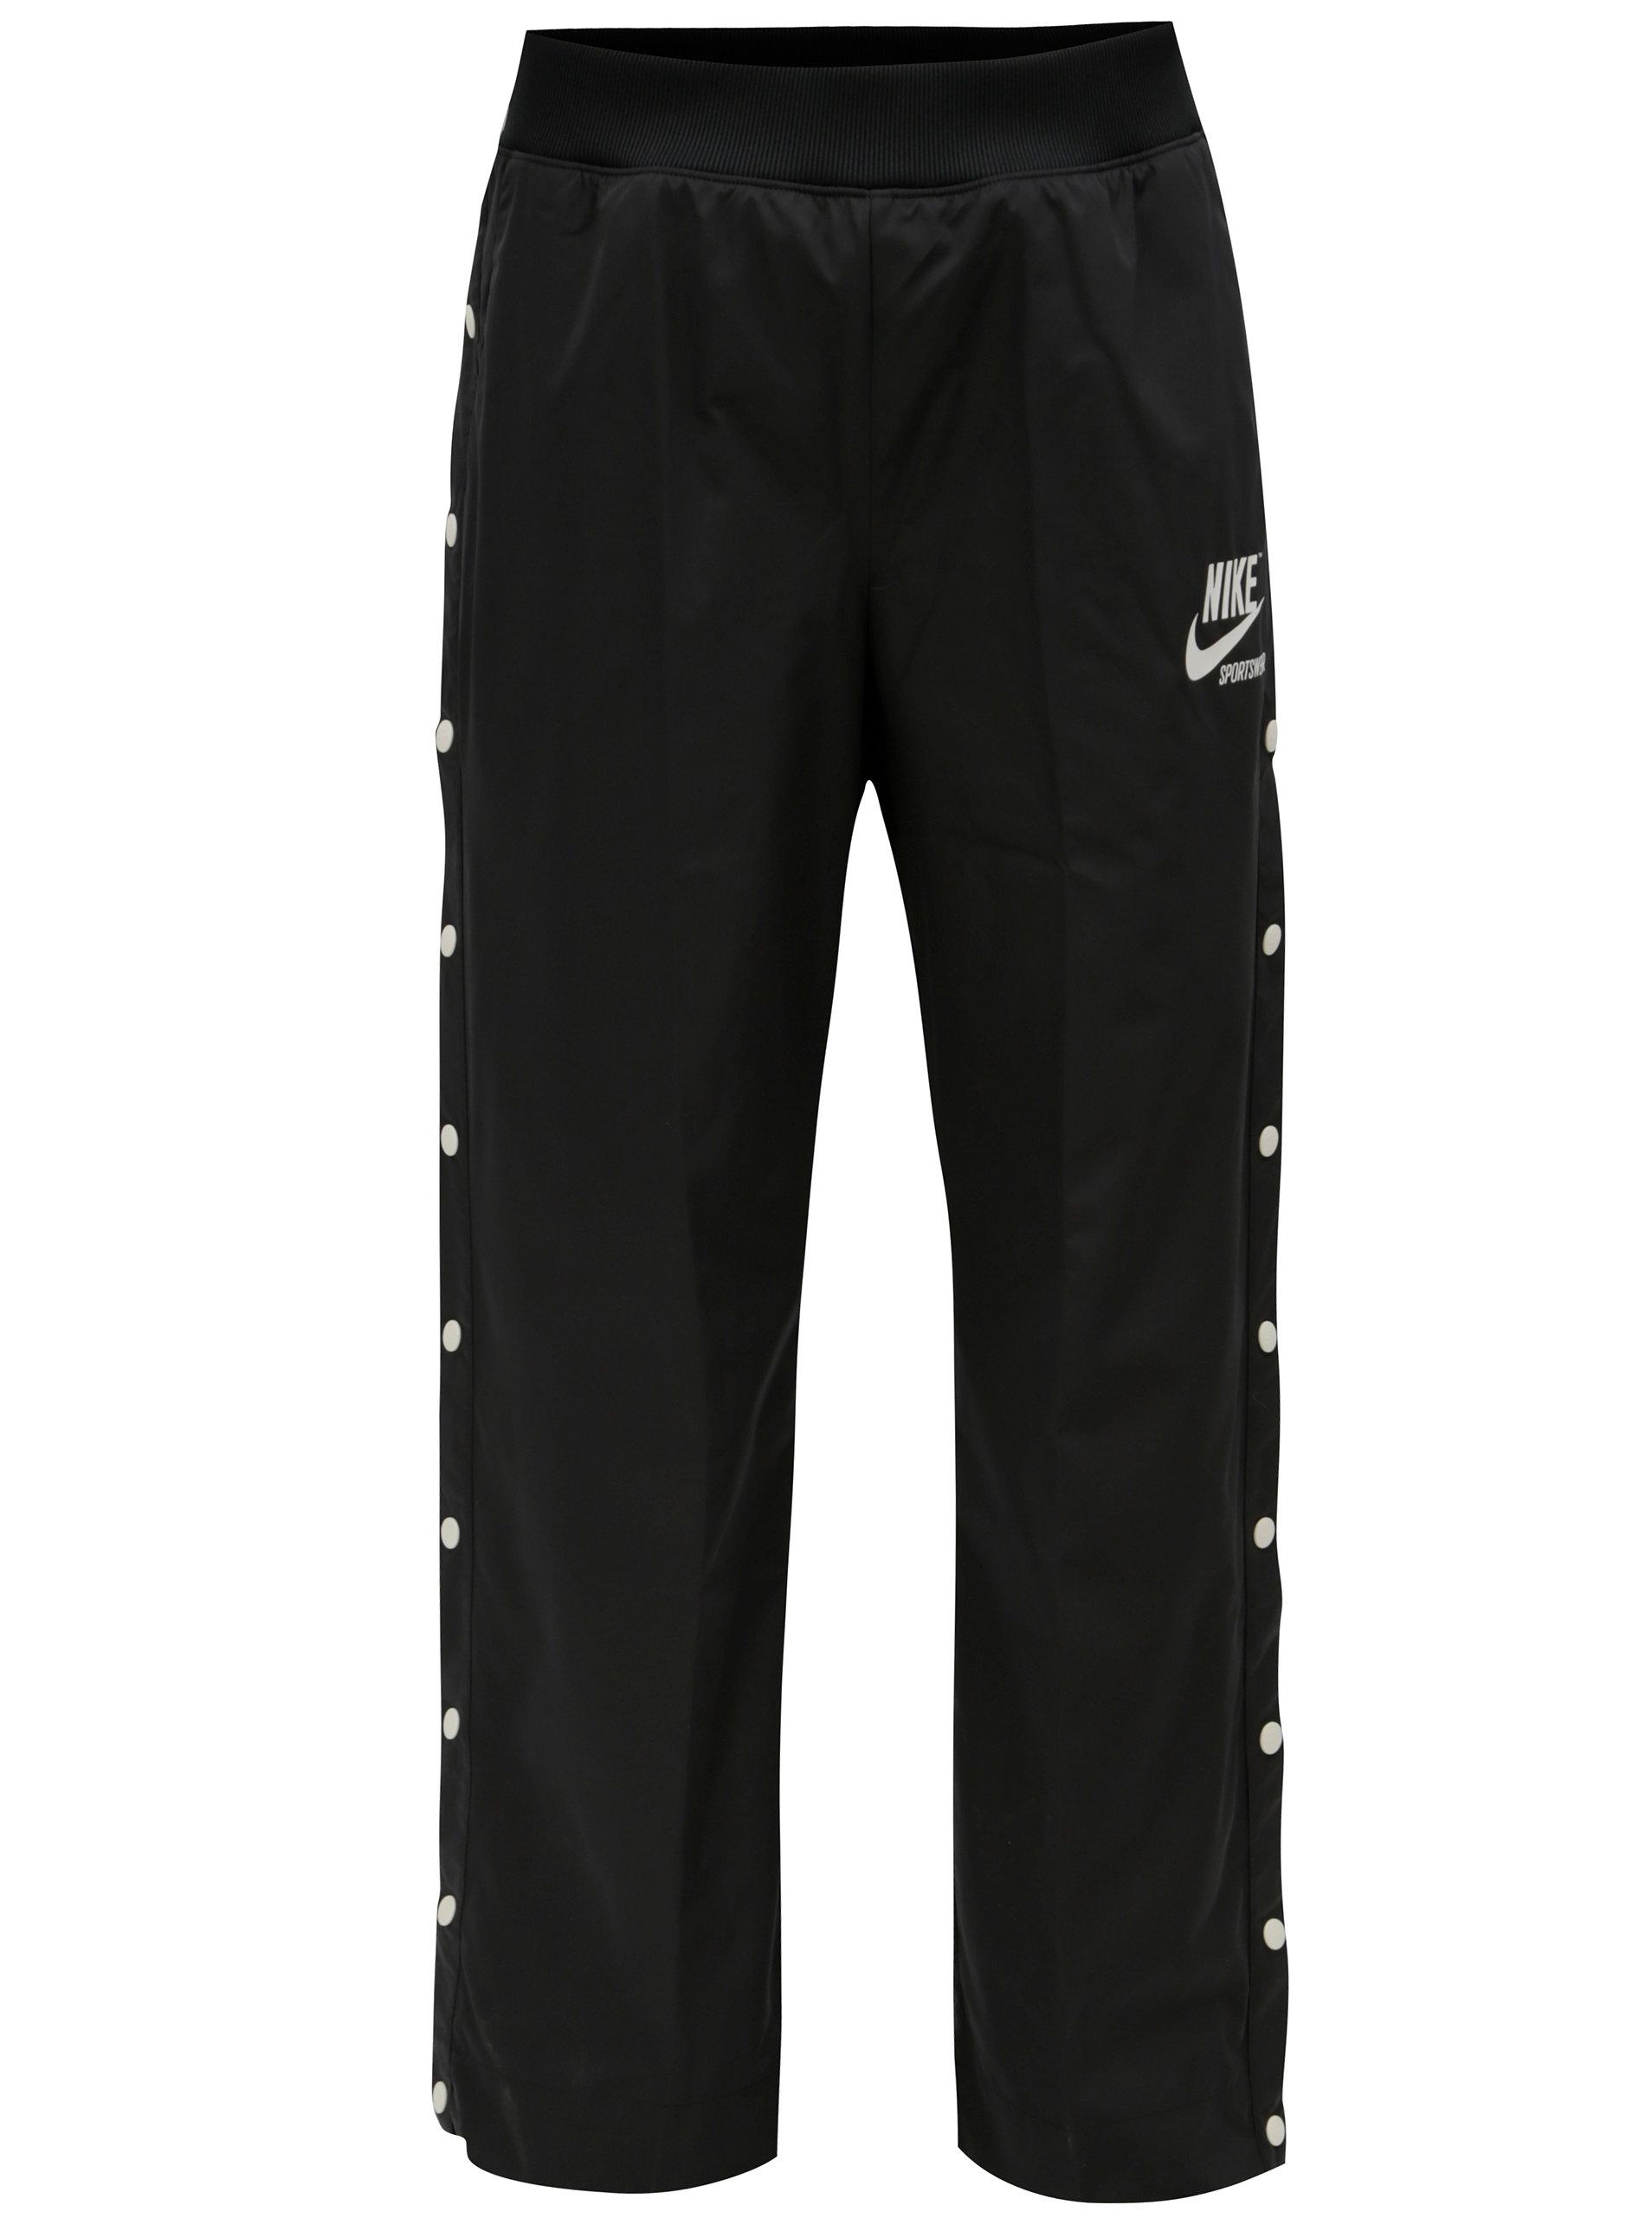 1ccd6b0e0bc Čierne dámske nohavice s patentkami na nohaviciach Nike pant ...